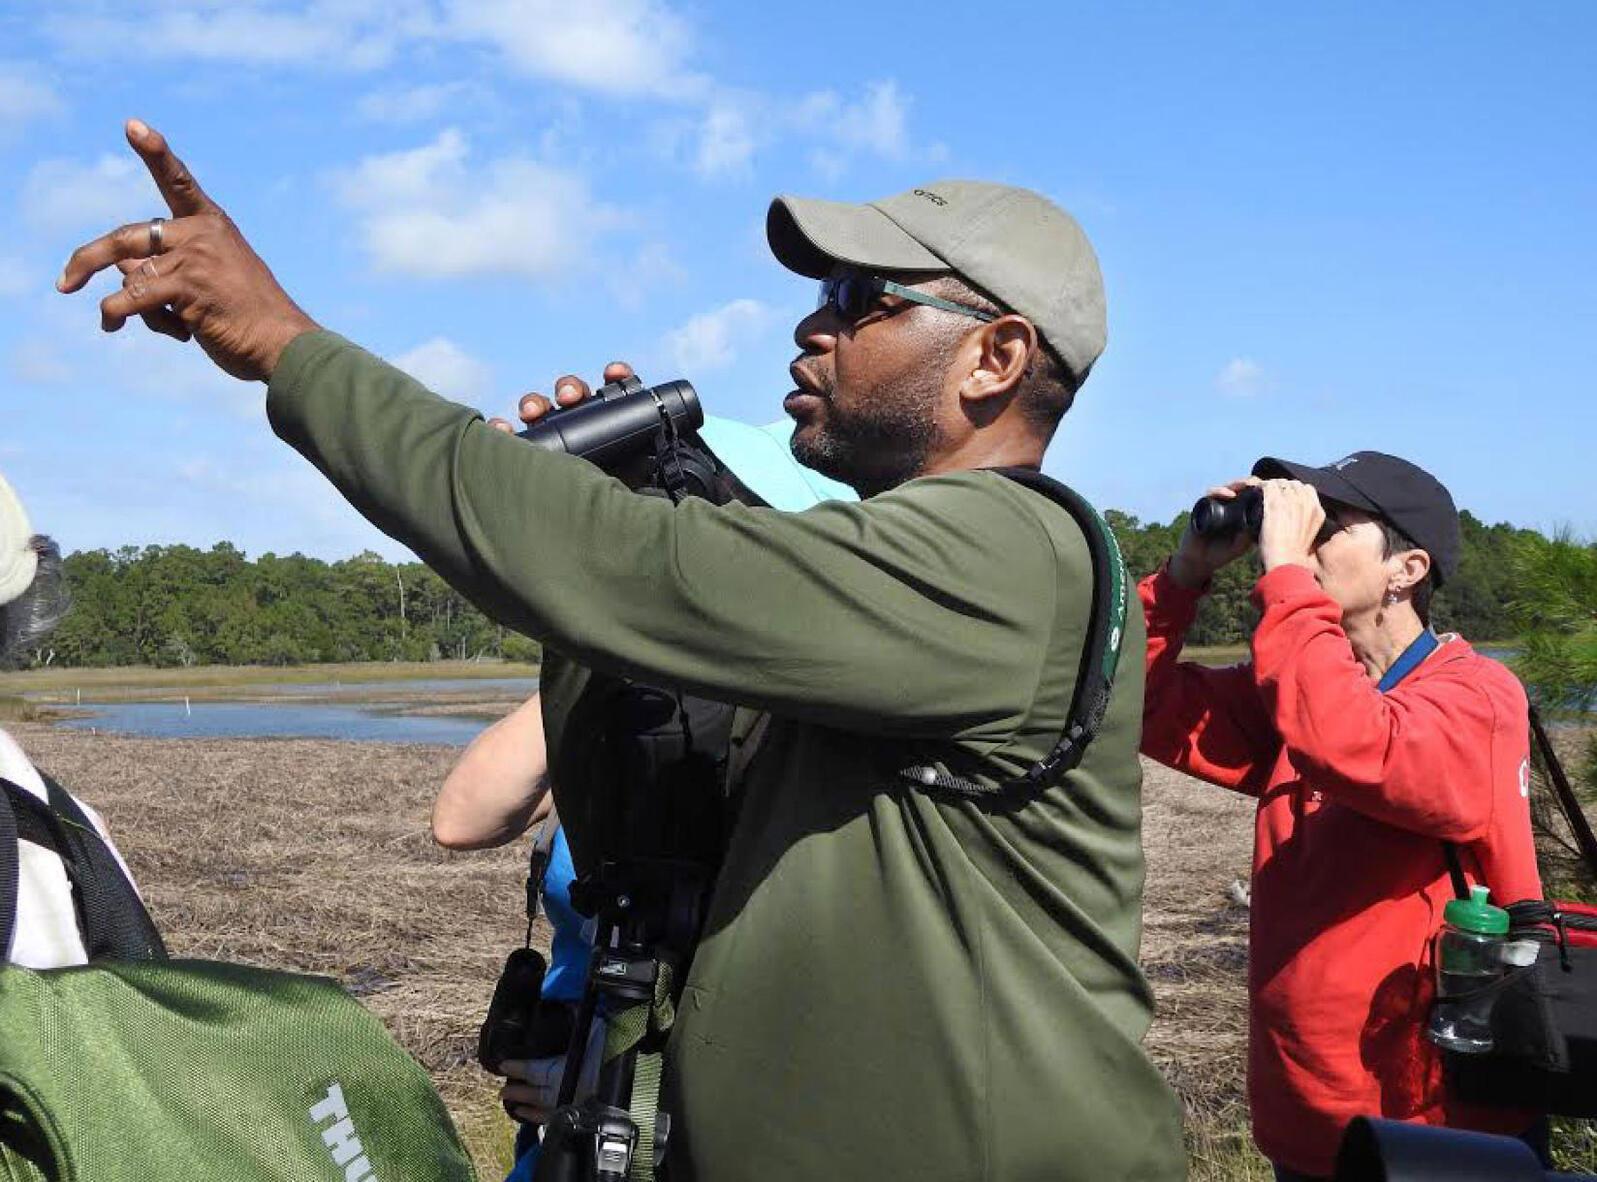 J. Drew Lanham leading a birding tour. Courtesy of J. Drew Lanham